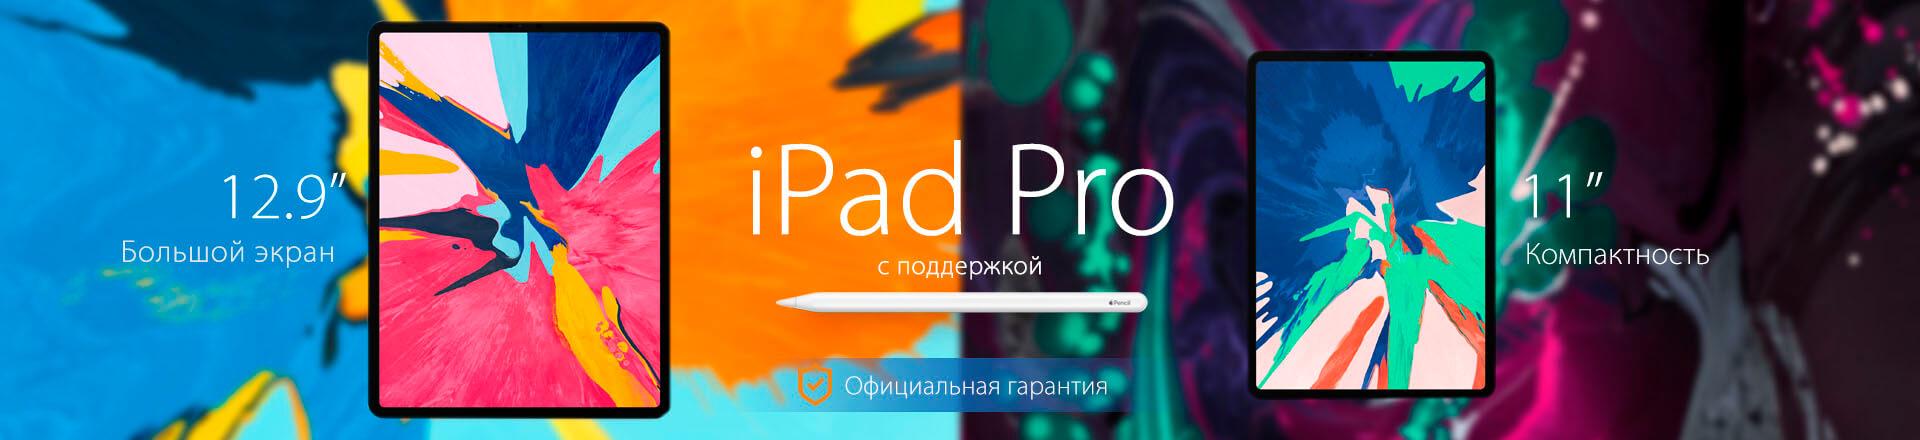 ipadpro2018